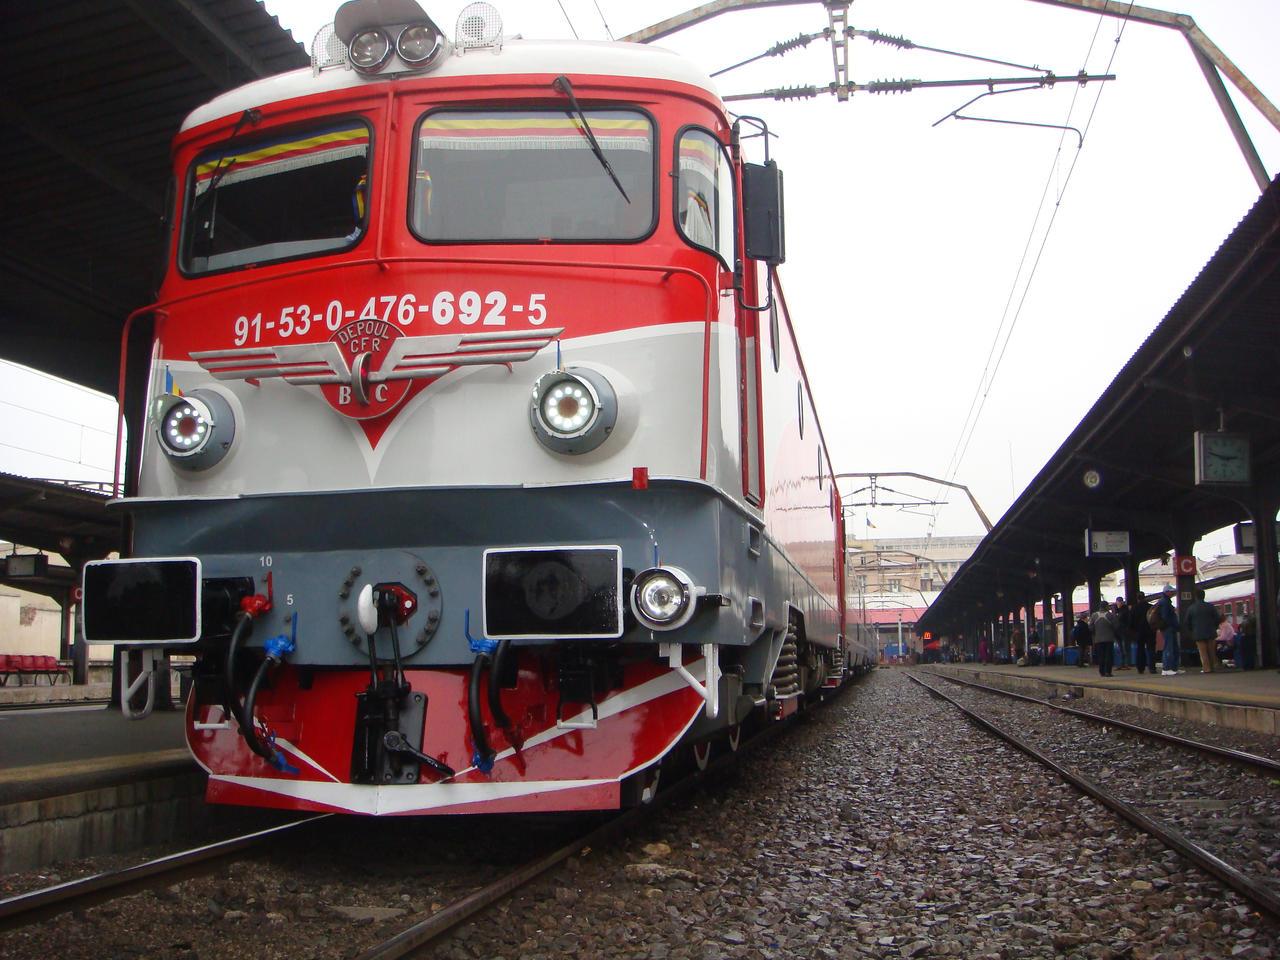 91-53-0-476-692-5 new look by MaTtRuLLz